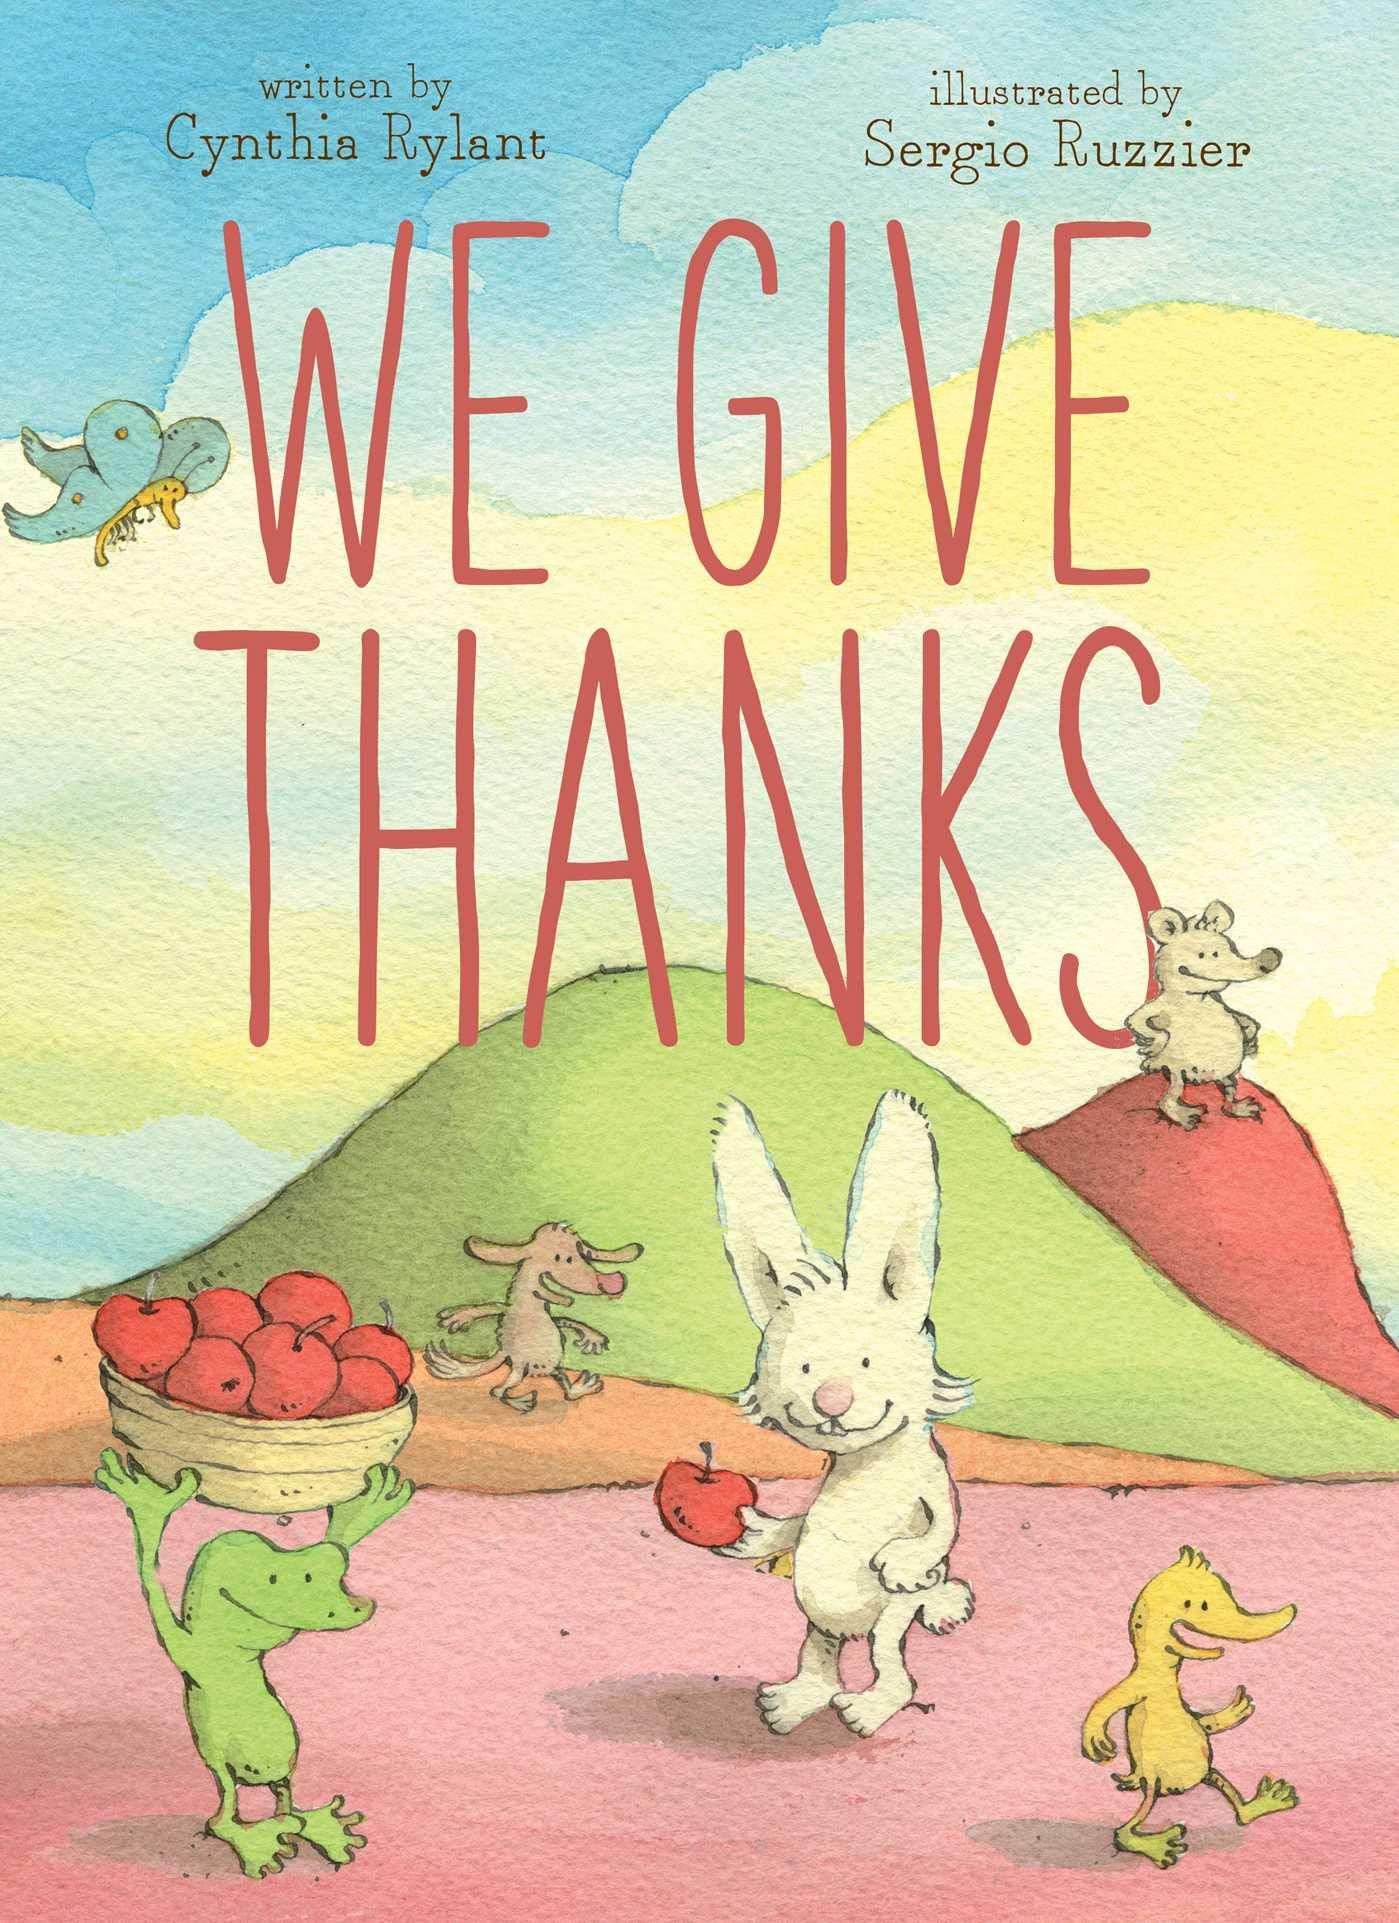 Amazon.com: We Give Thanks: 9781442465077: Rylant, Cynthia, Ruzzier,  Sergio: Books